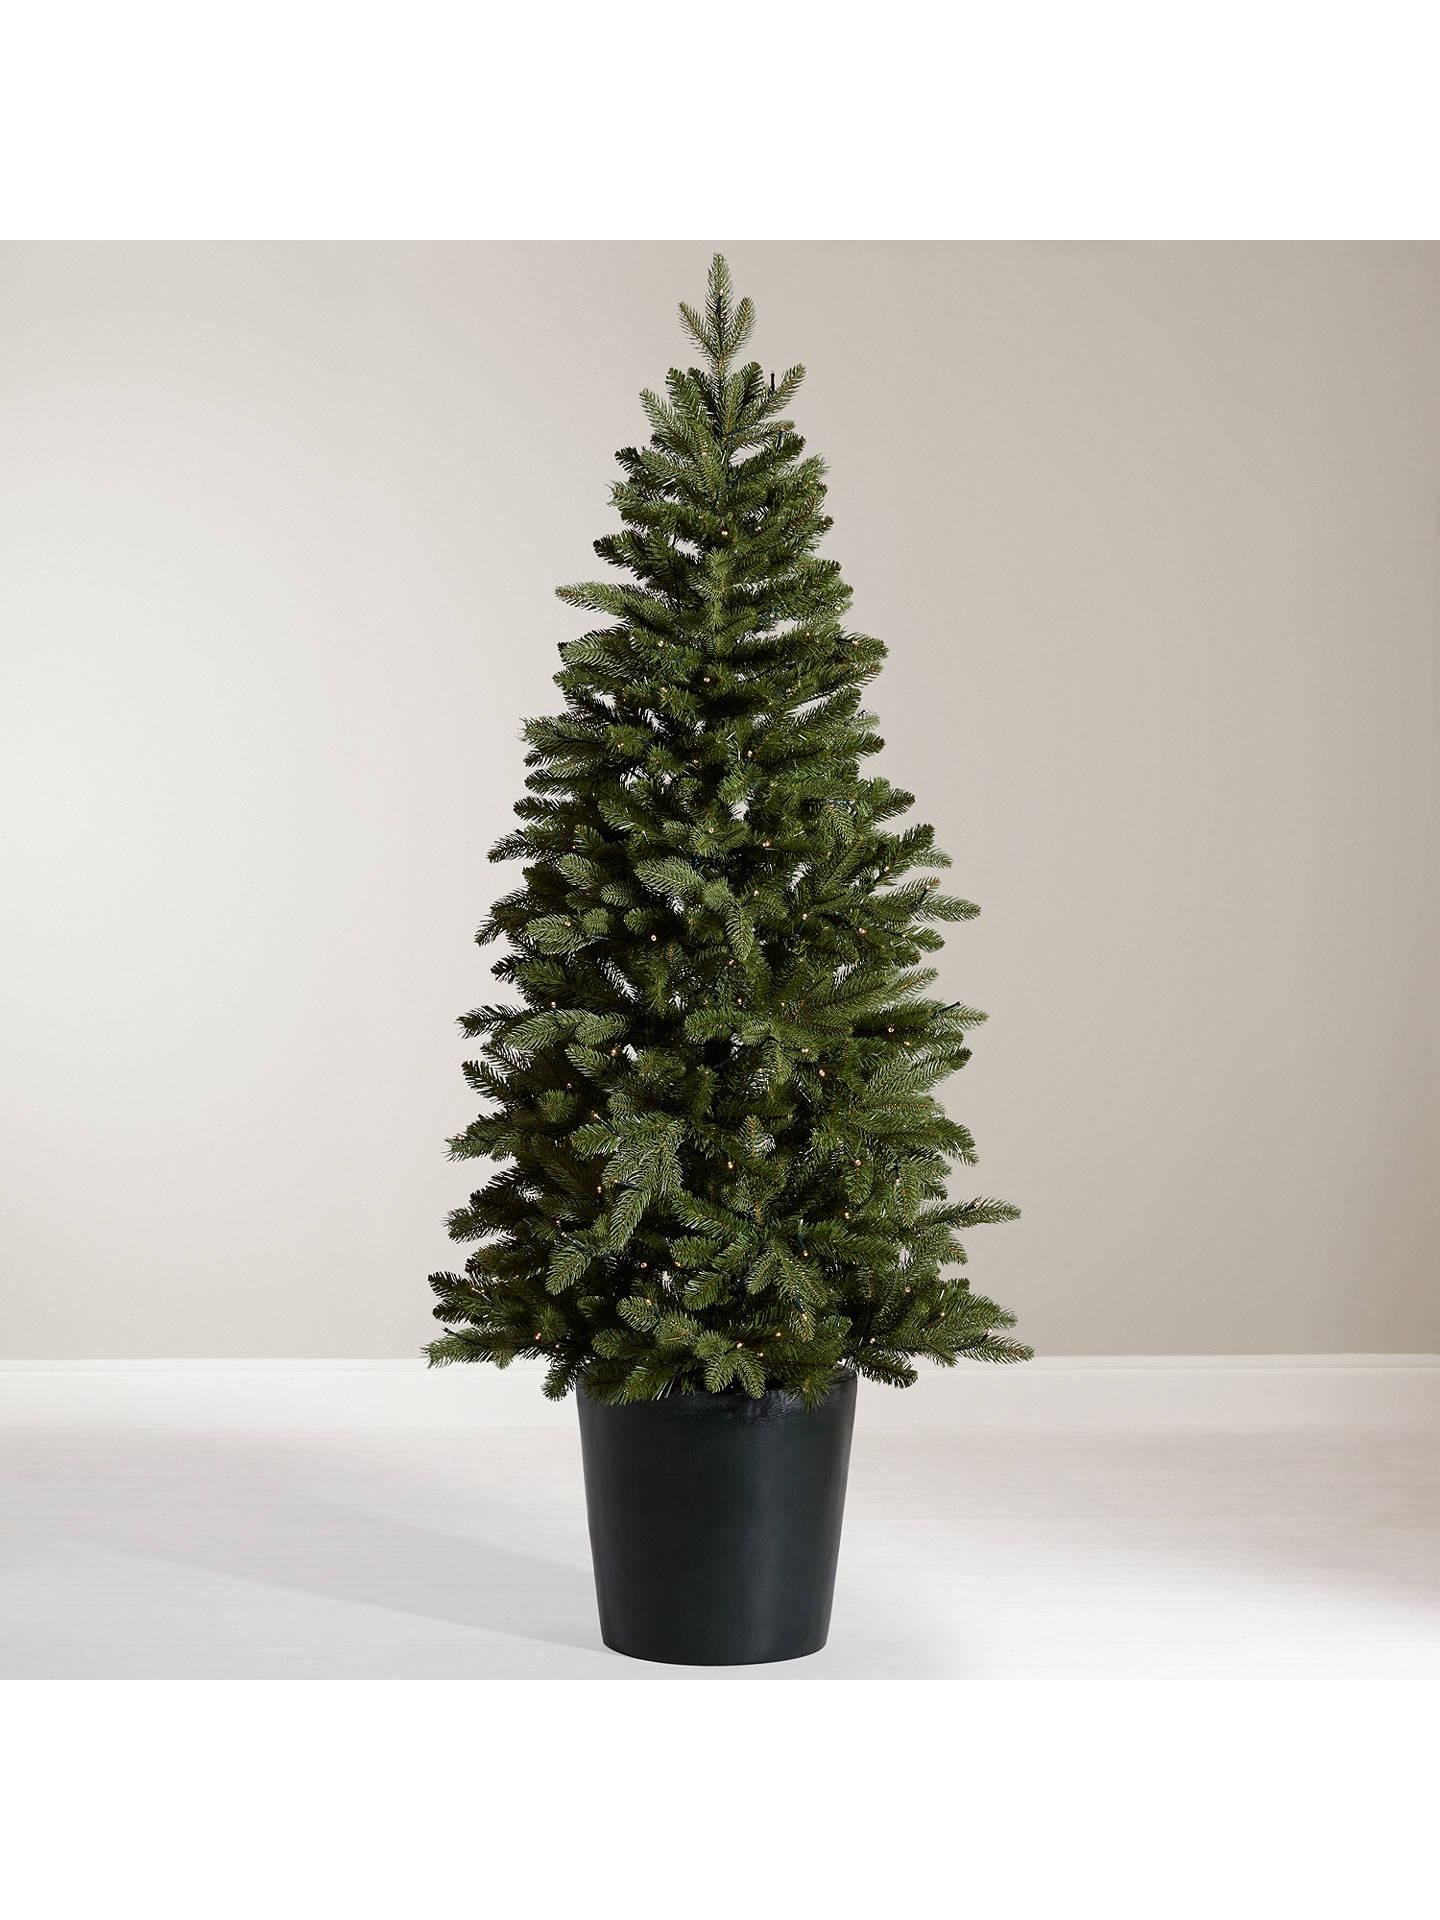 sale retailer 9103e 187c9 John Lewis & Partners Bala Potted Pre-lit Christmas Tree, 5.5ft